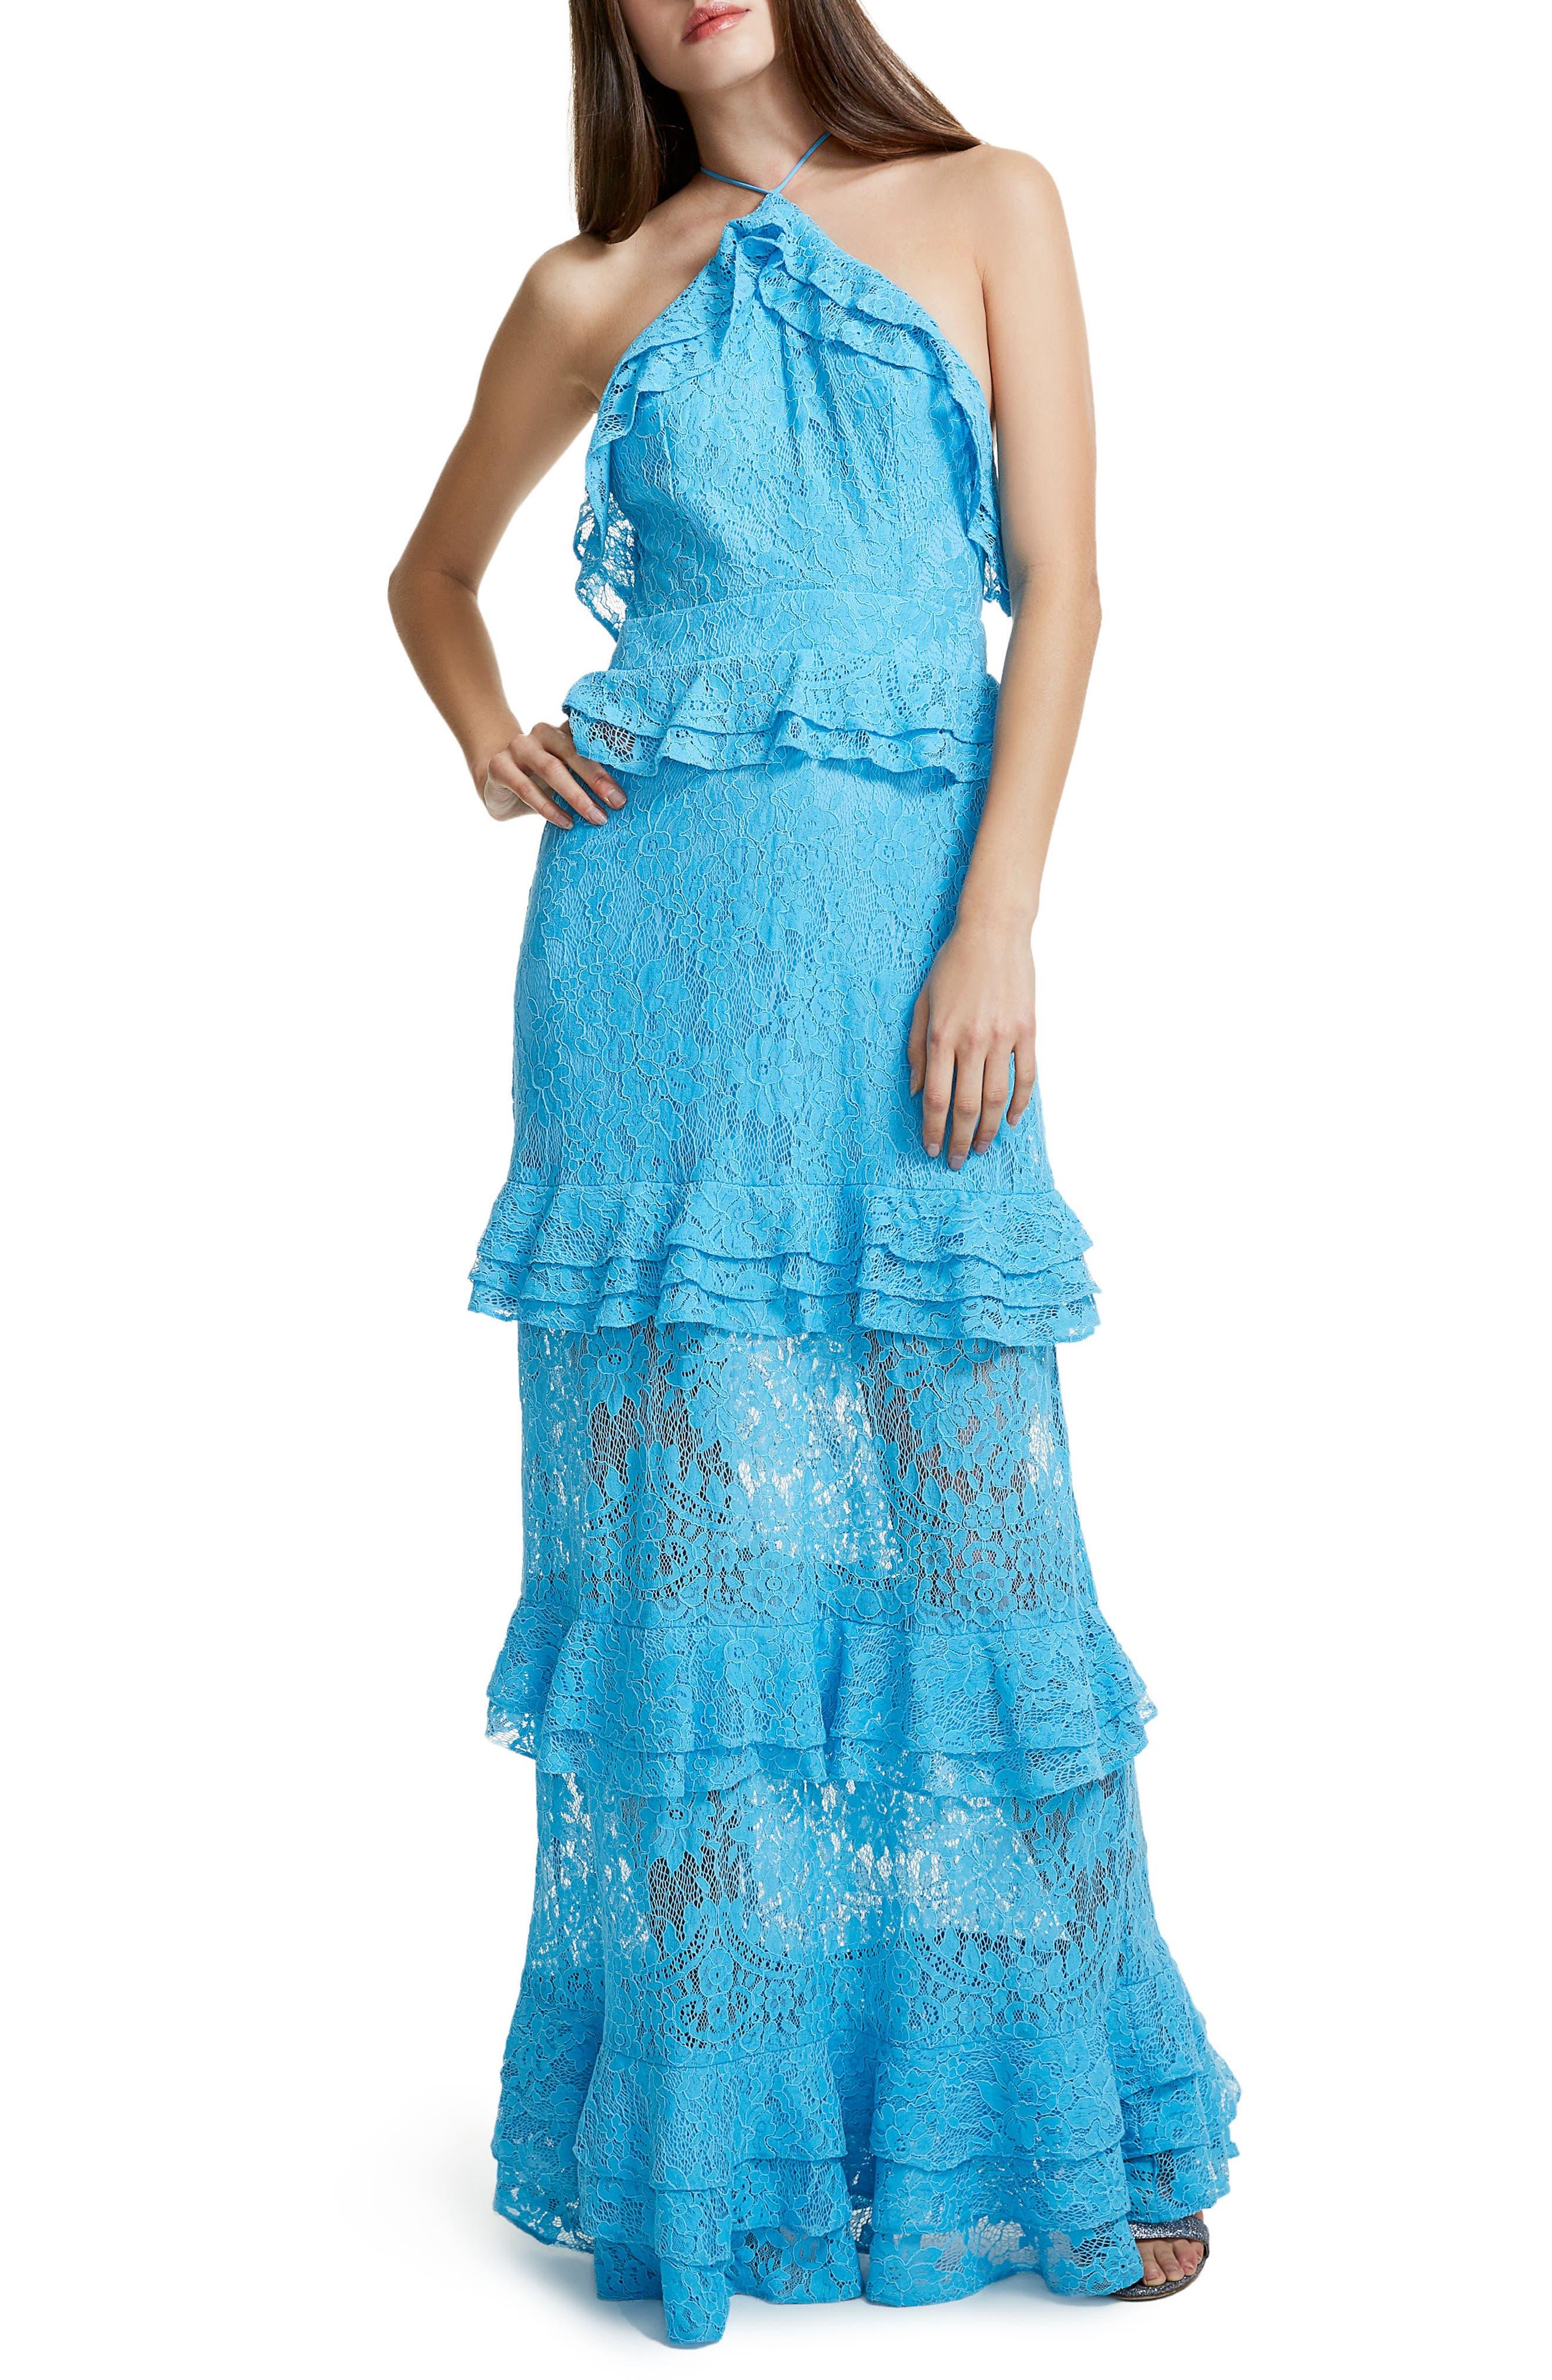 Violet Ruffle Maxi Dress,                             Main thumbnail 1, color,                             400